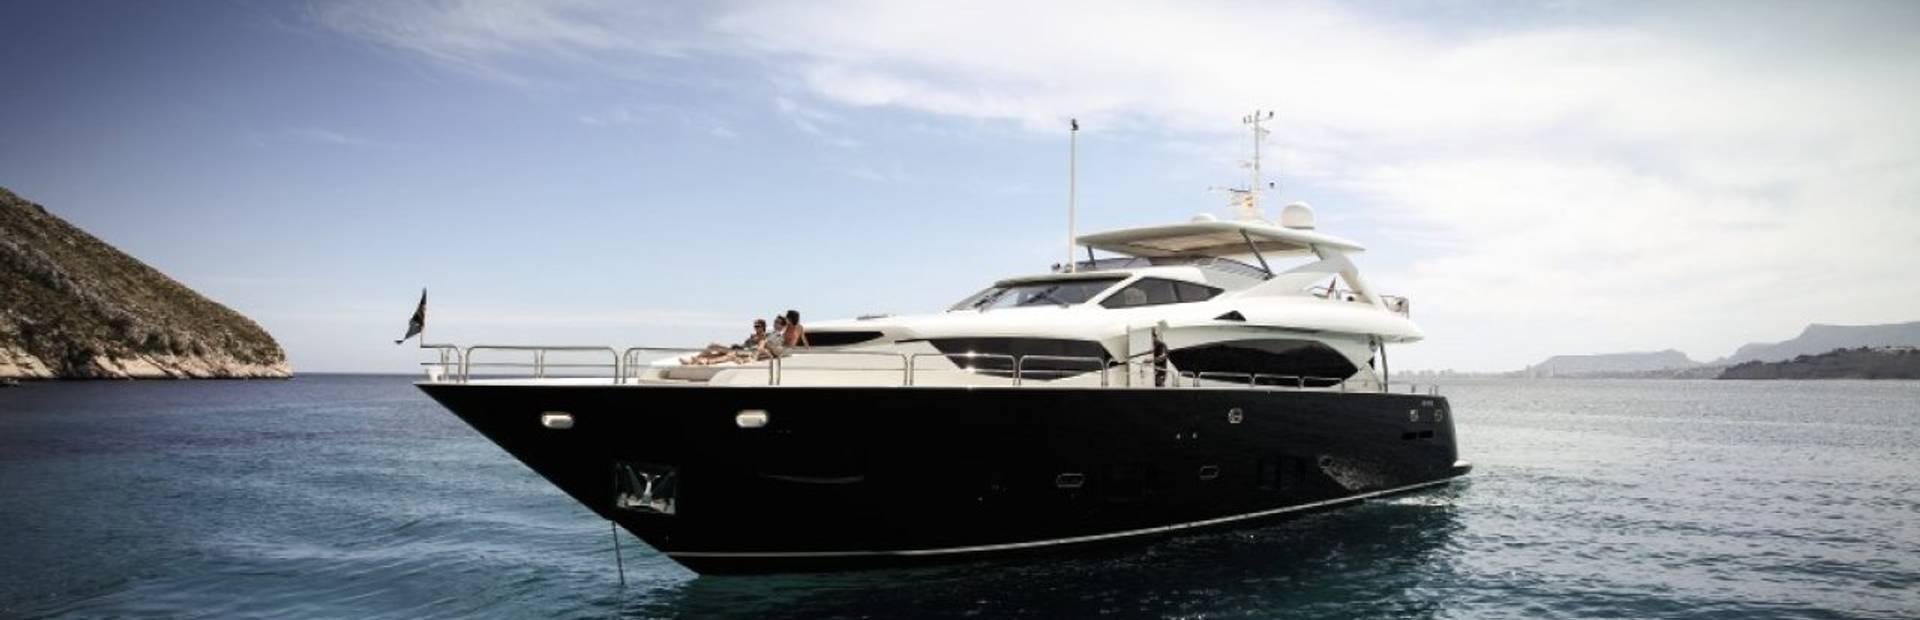 30 Metre Yacht Yacht Charter